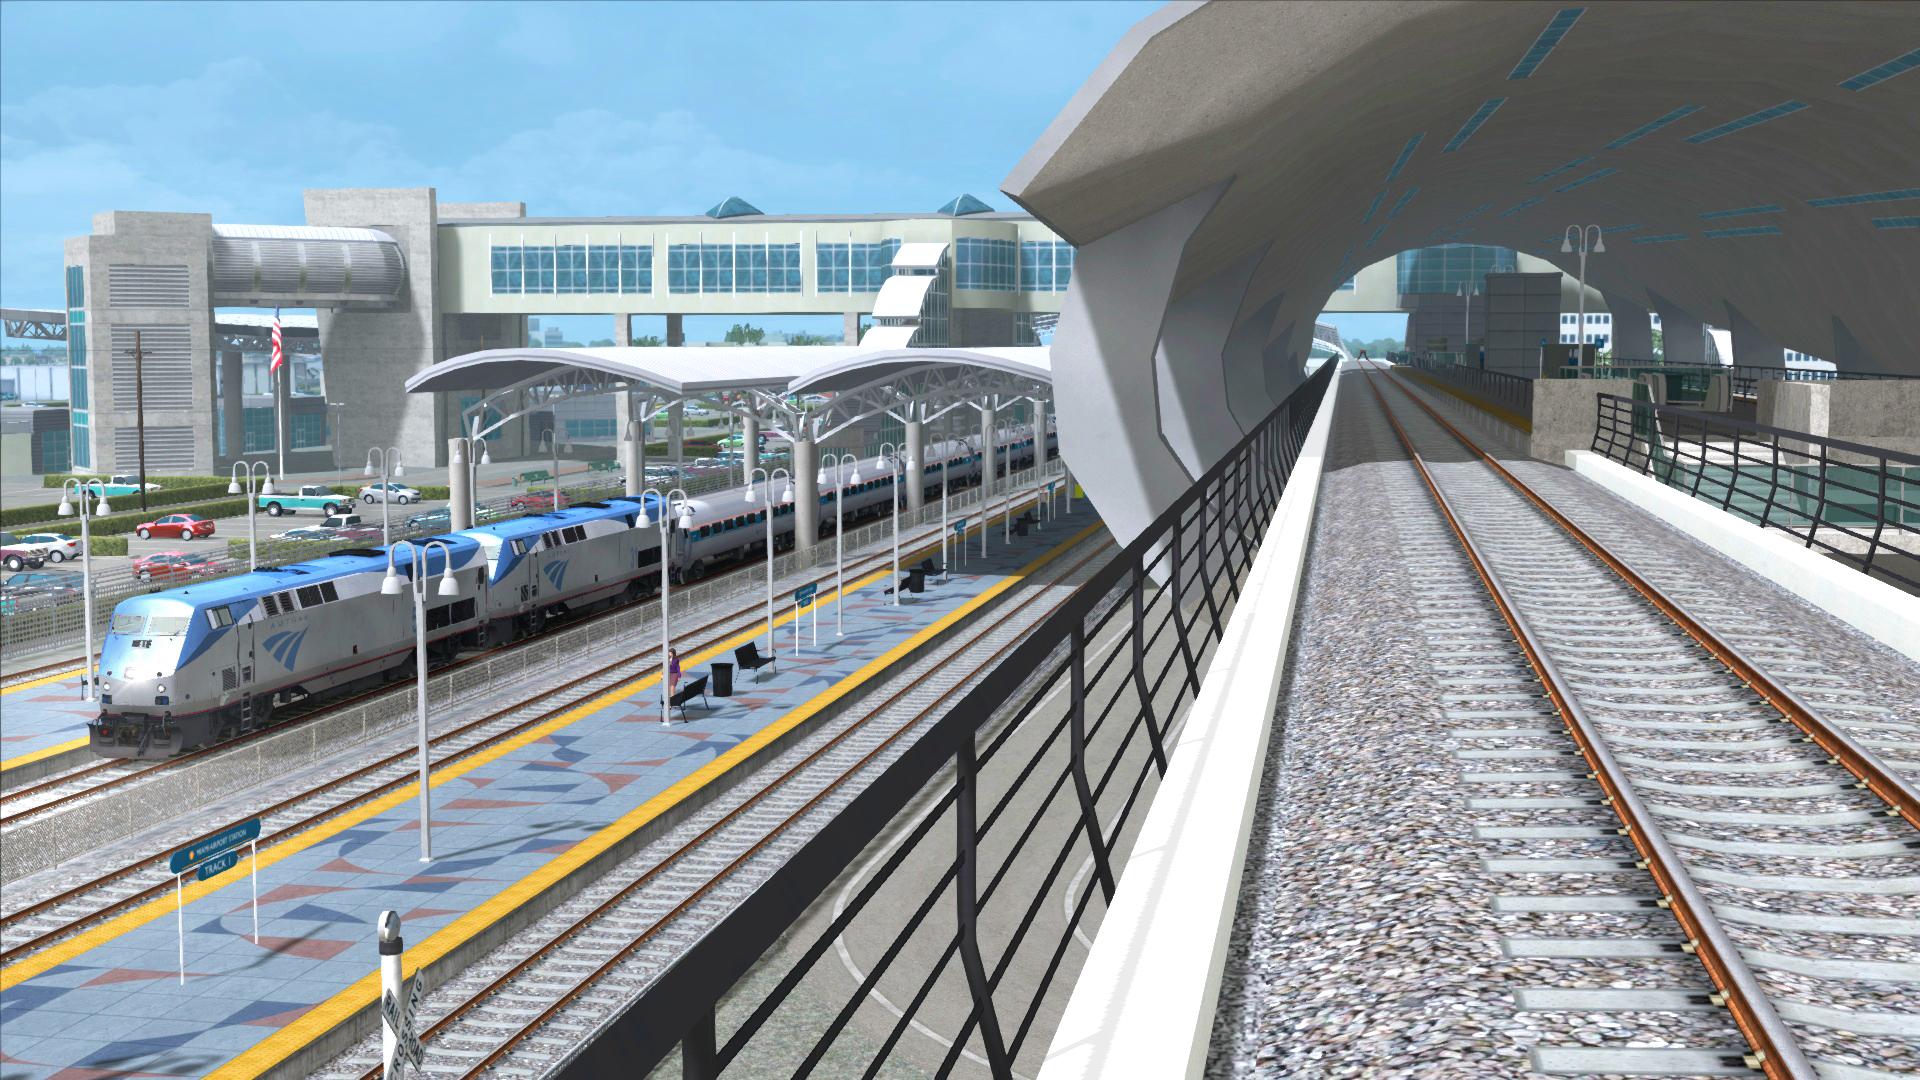 Miami To West Palm Beach Train Simulator